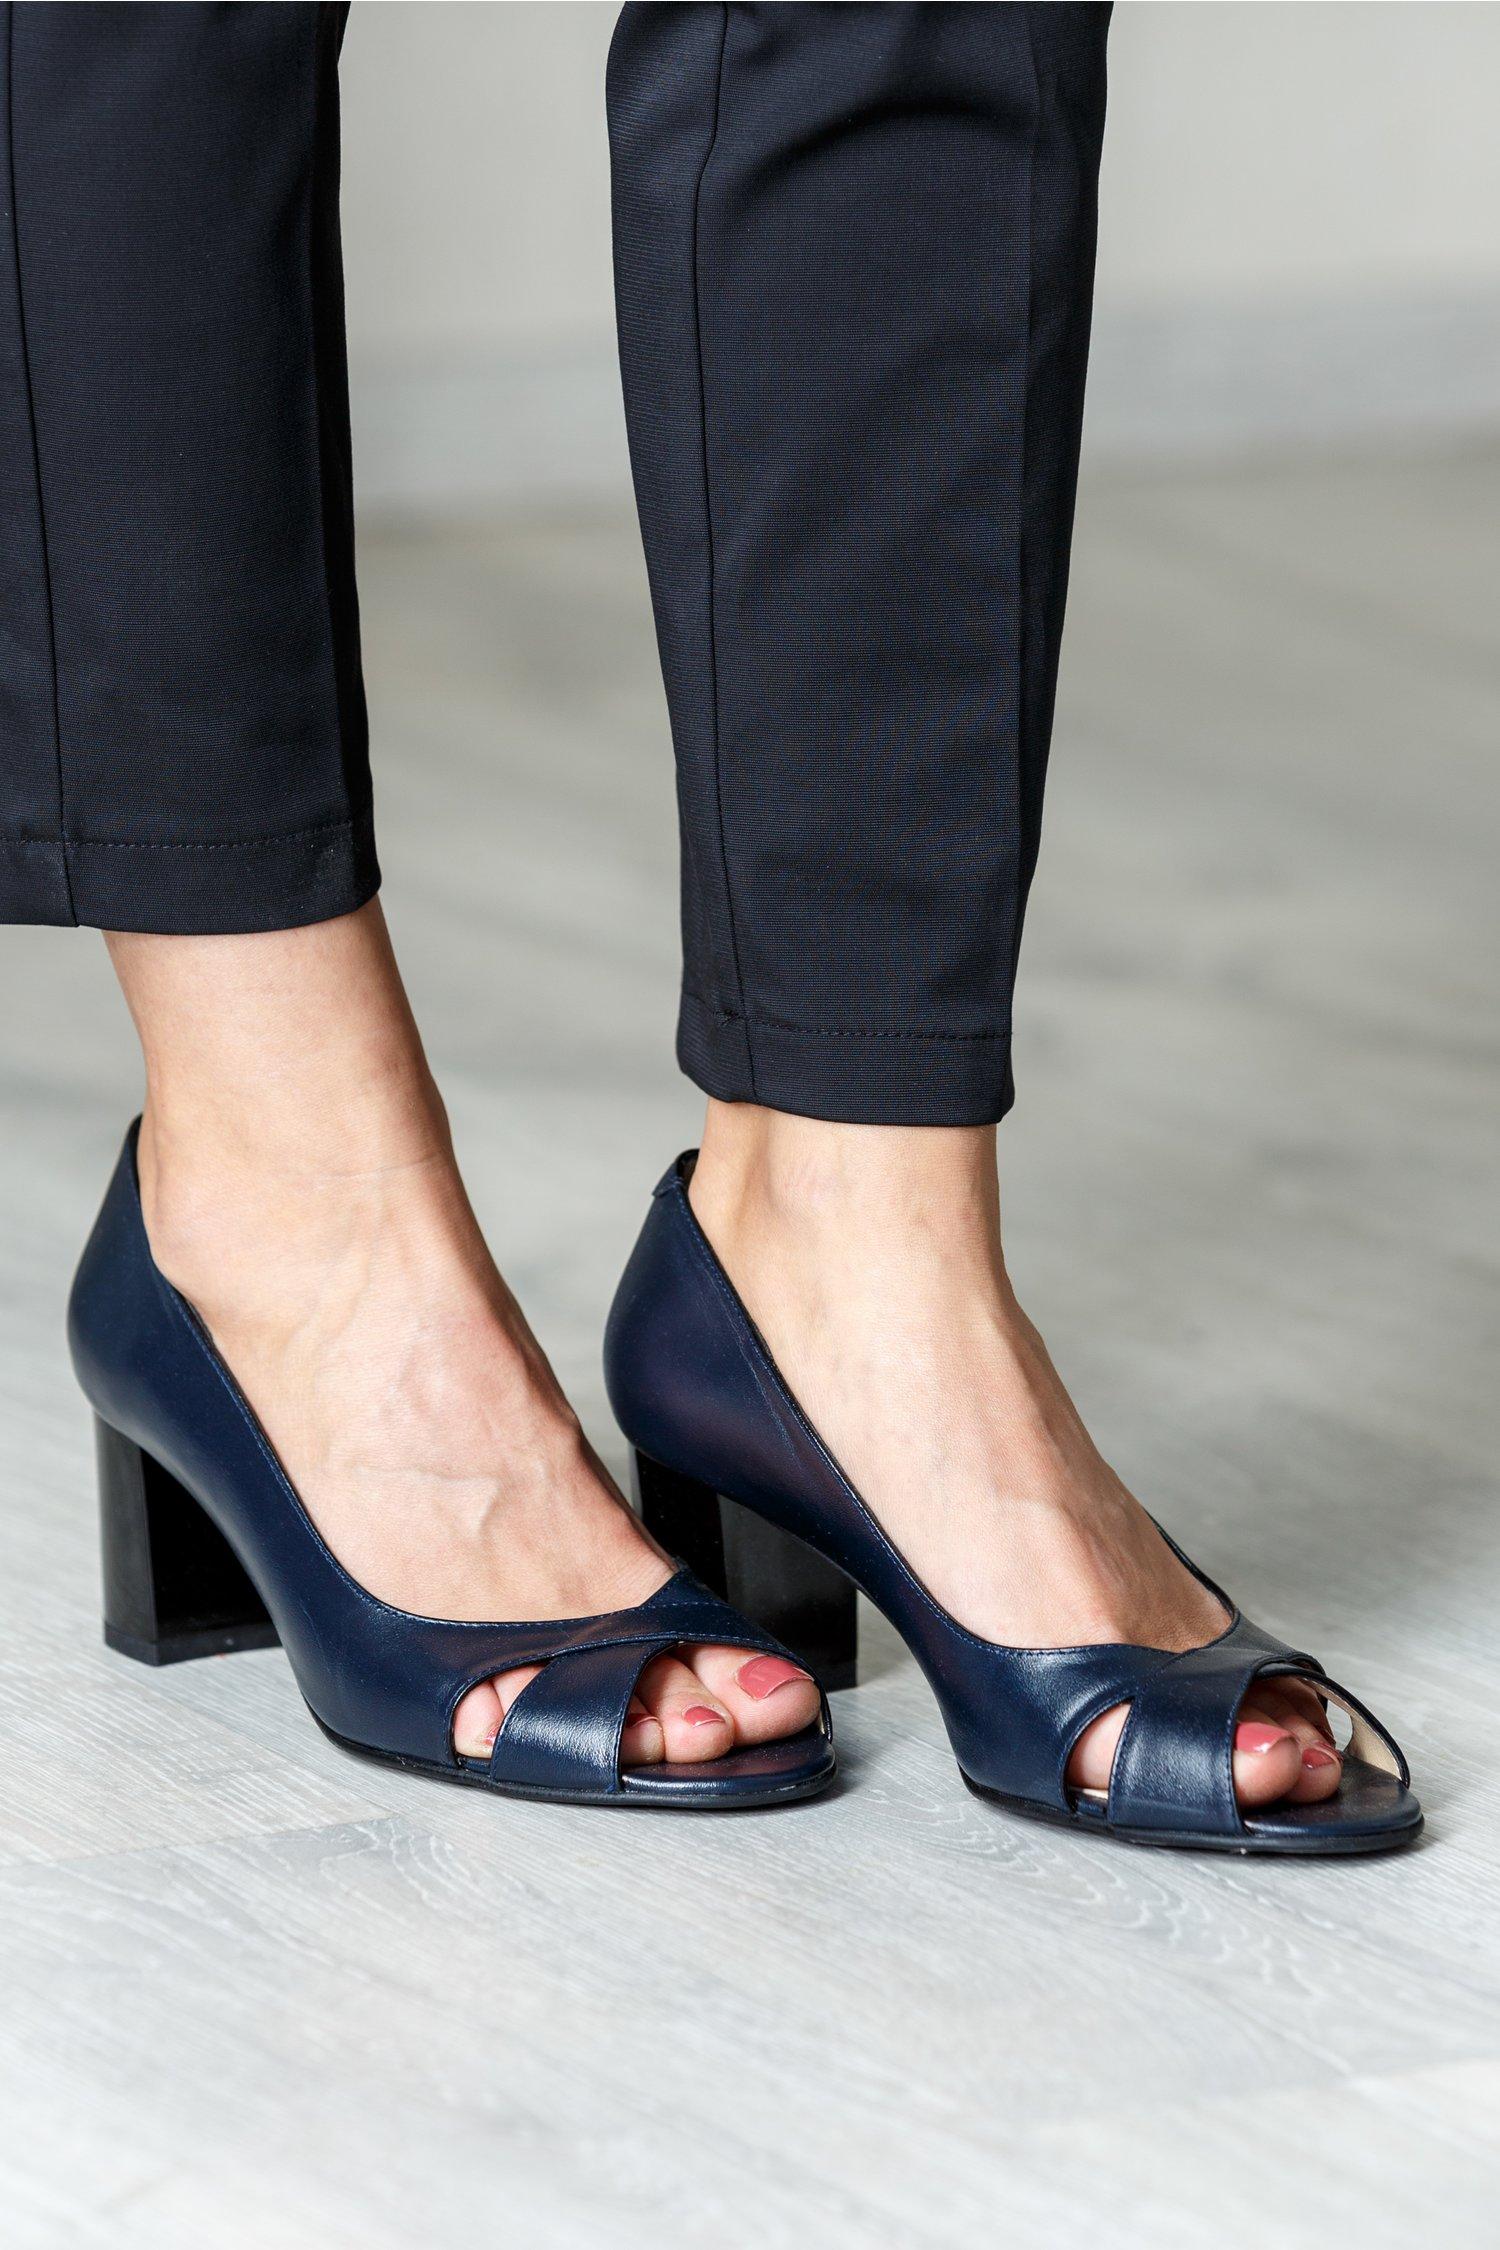 Pantofi bleumarin eleganti cu toc mediu si decupaj